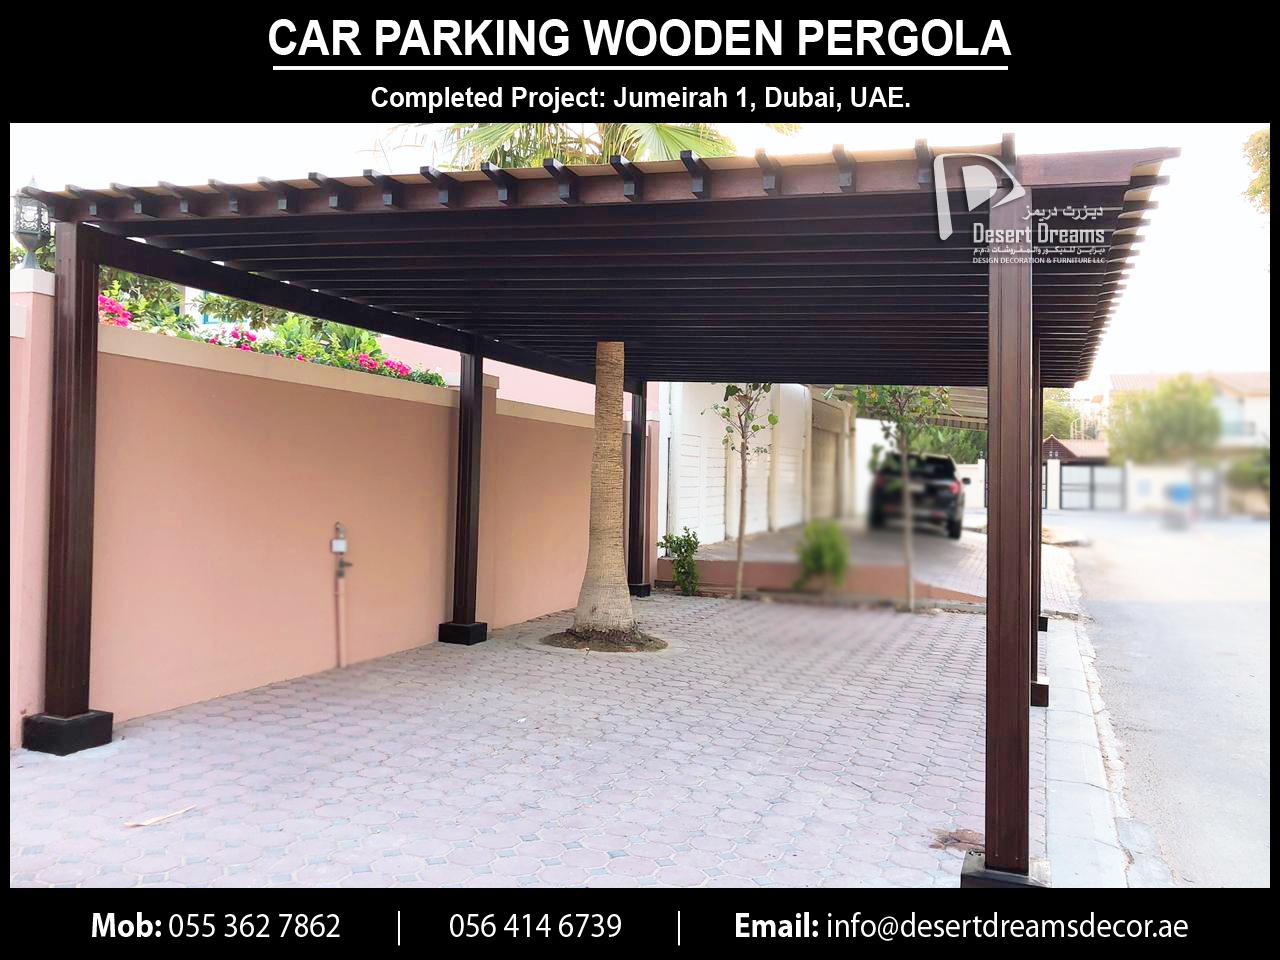 Car Parking Wooden Pergola UAE_Pergola Images_Desert Dreams (1).jpg